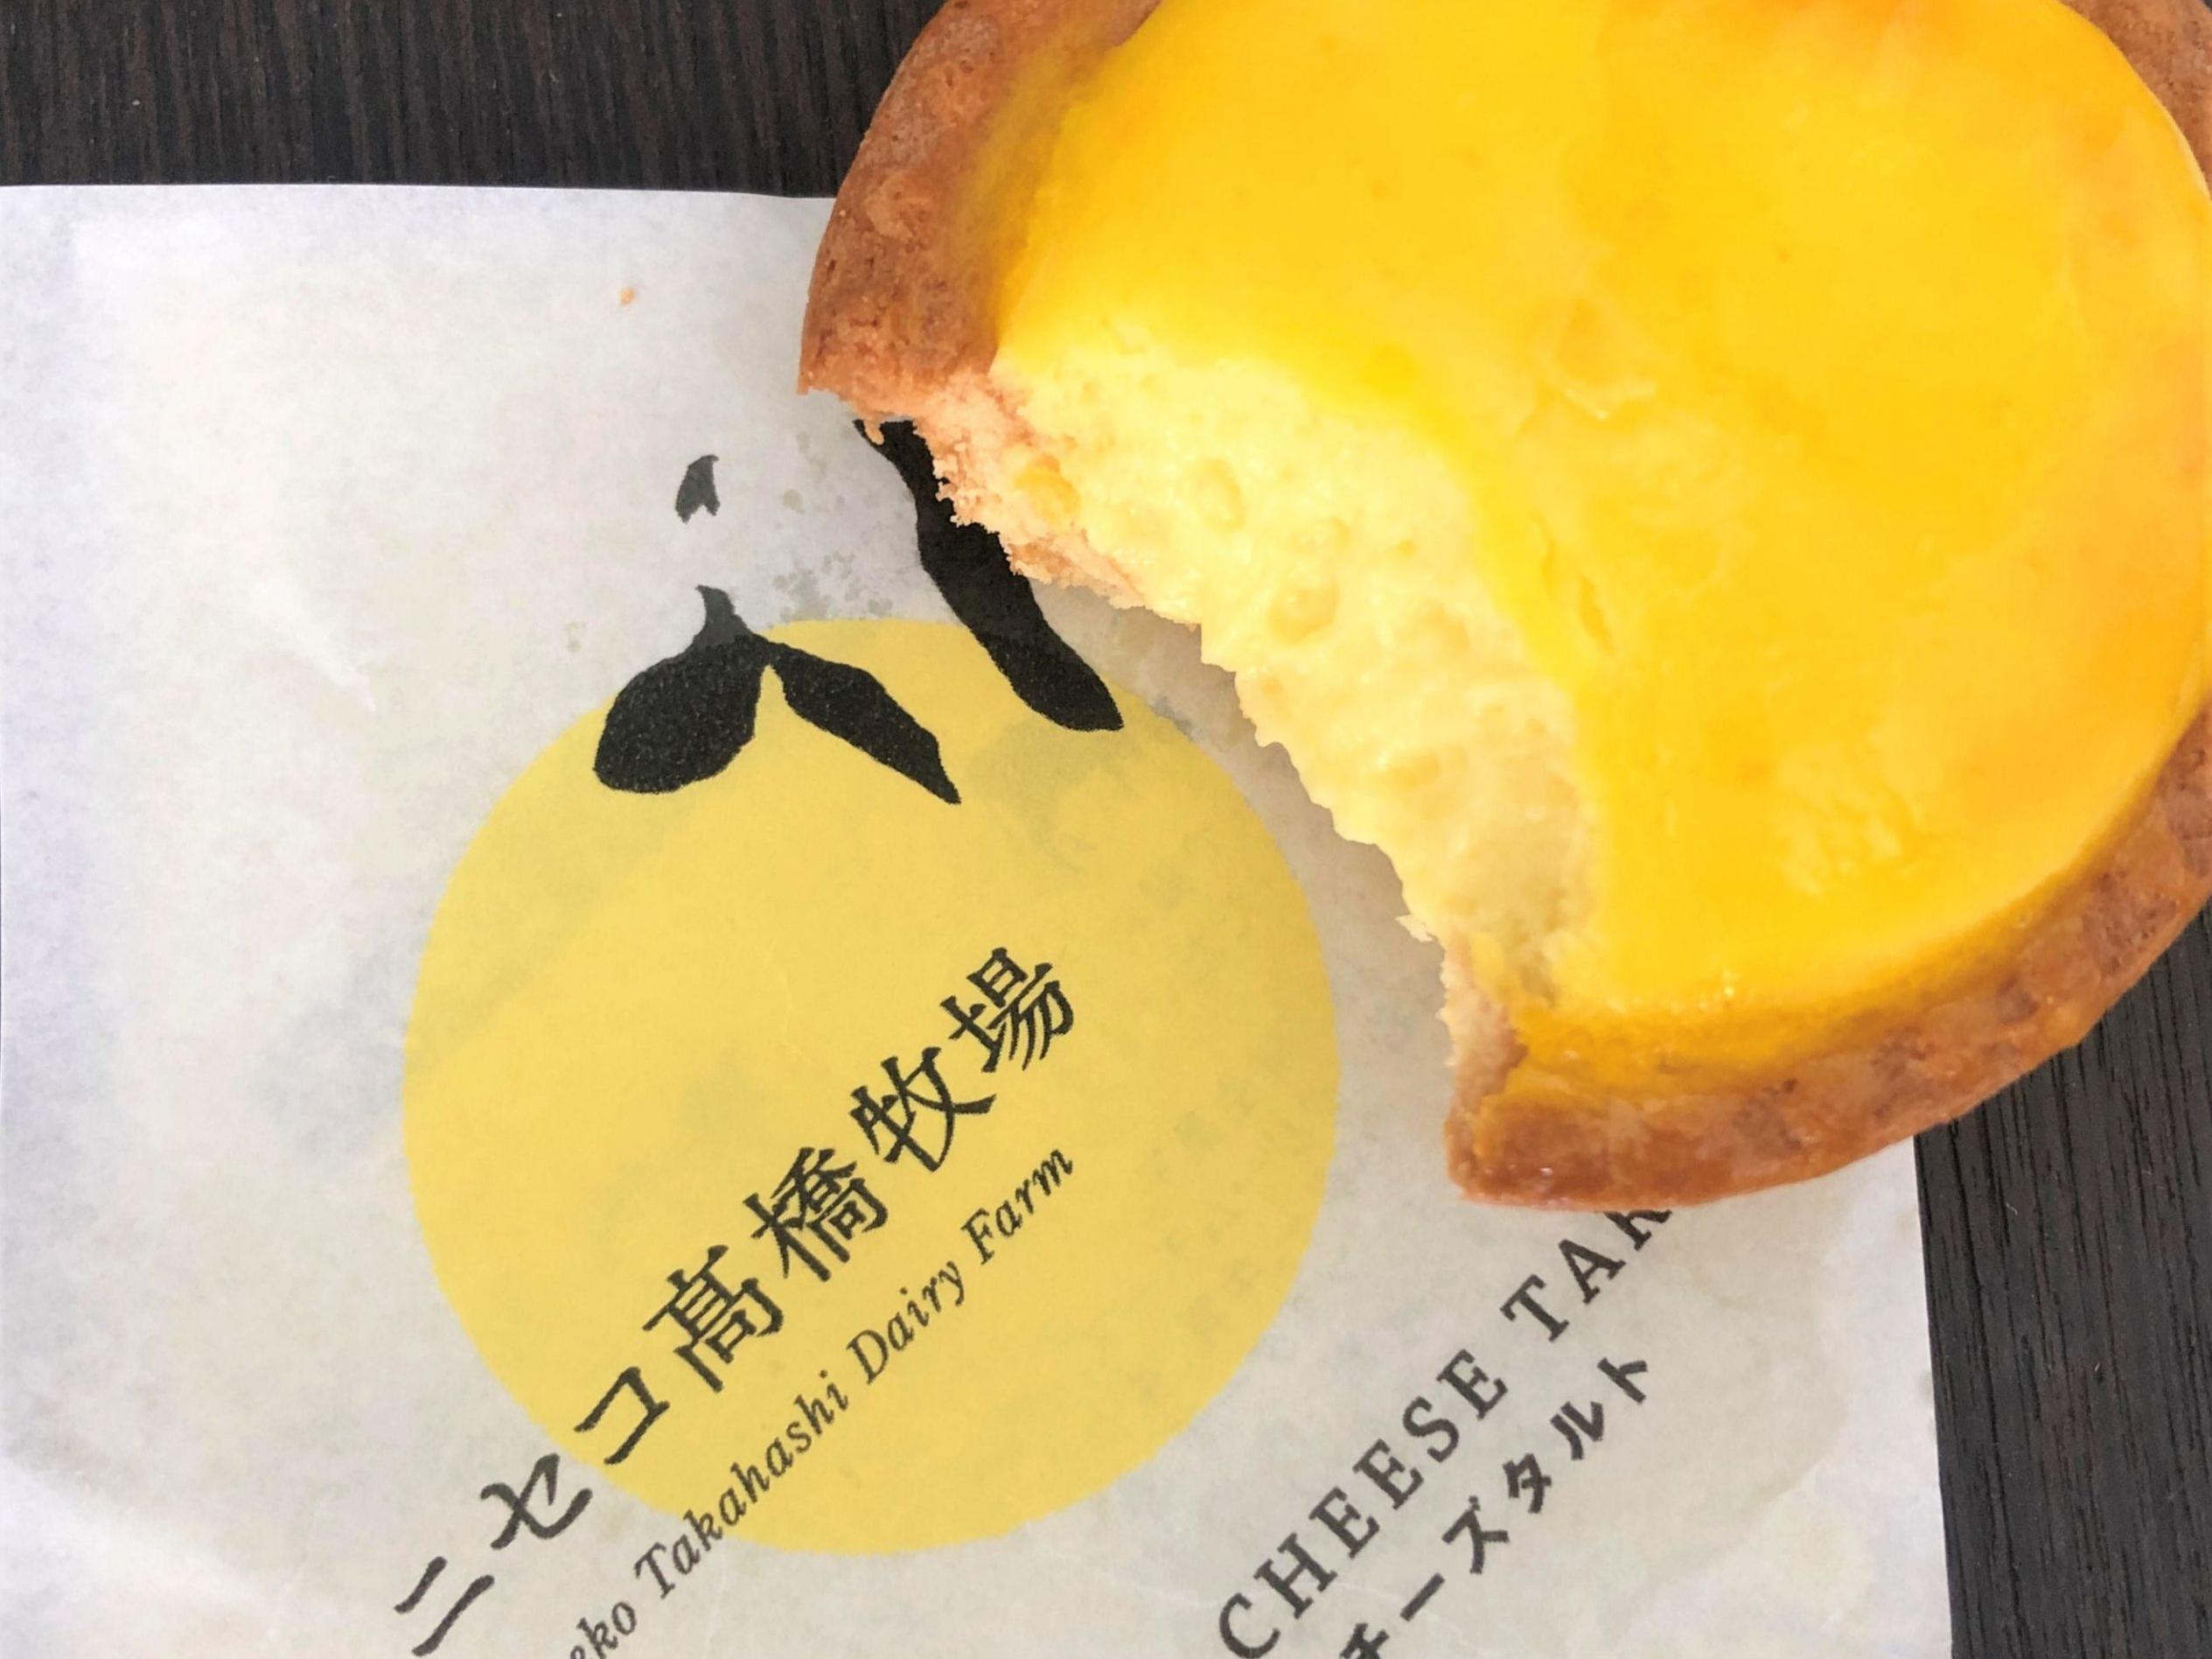 Milk kobo niseko takahashi farm near Chatrium Niseko Japan